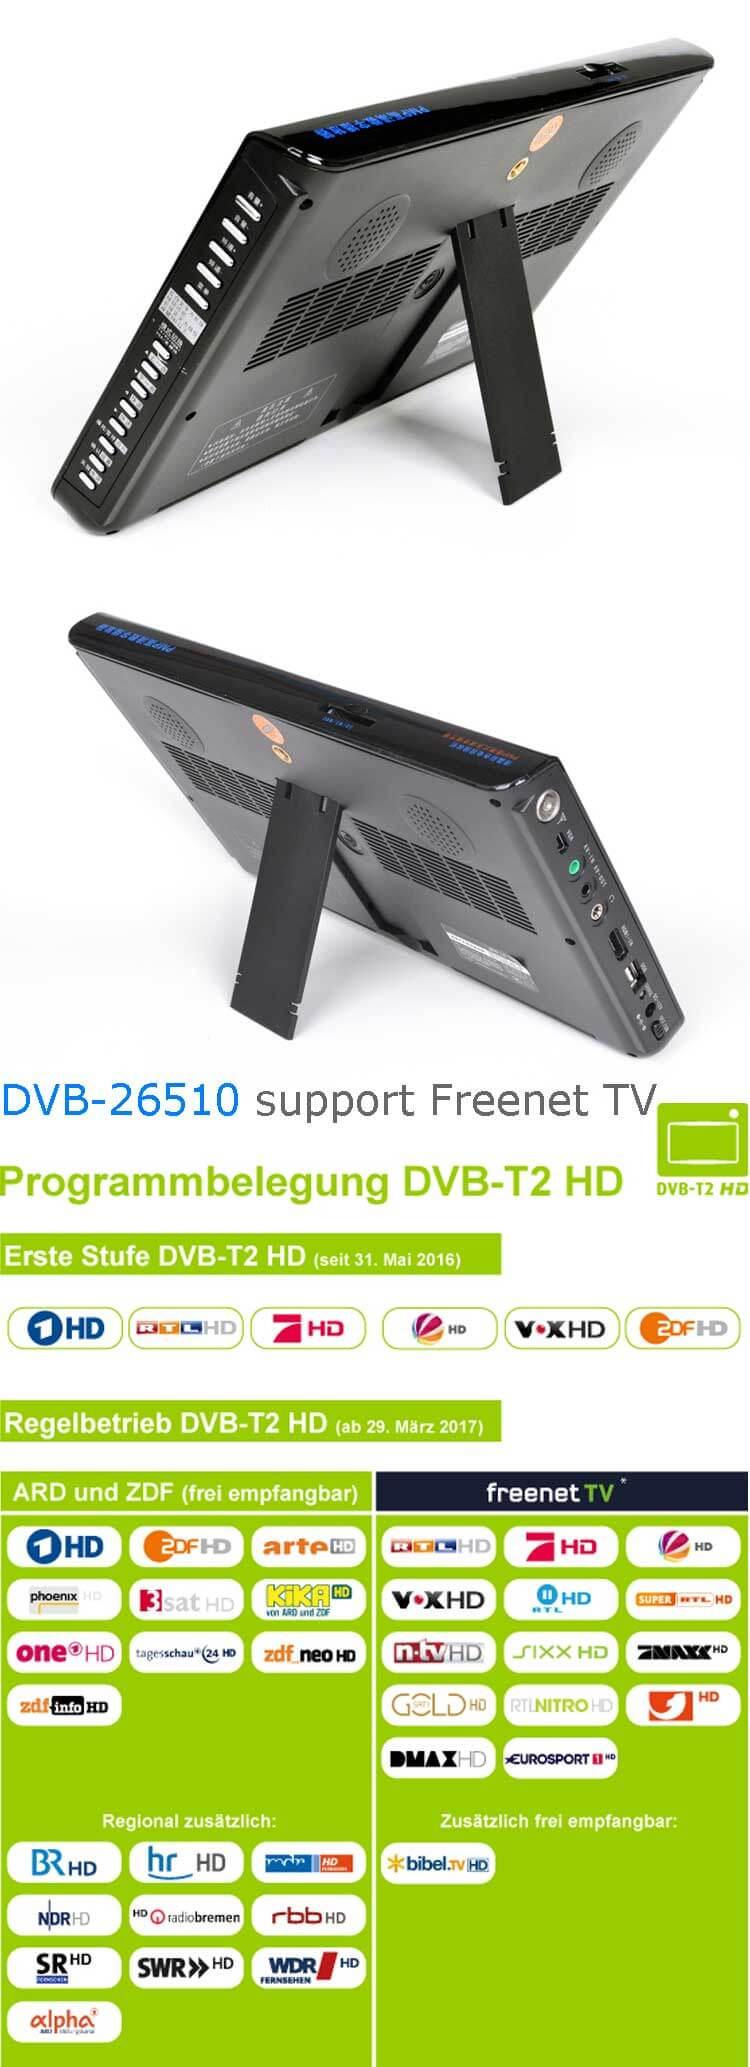 10 DVB-T2 H265 HEVC AC3 Codec Portable TV PVR Multimedia Player Analog kitchen bedroom car DVB-T26510 15